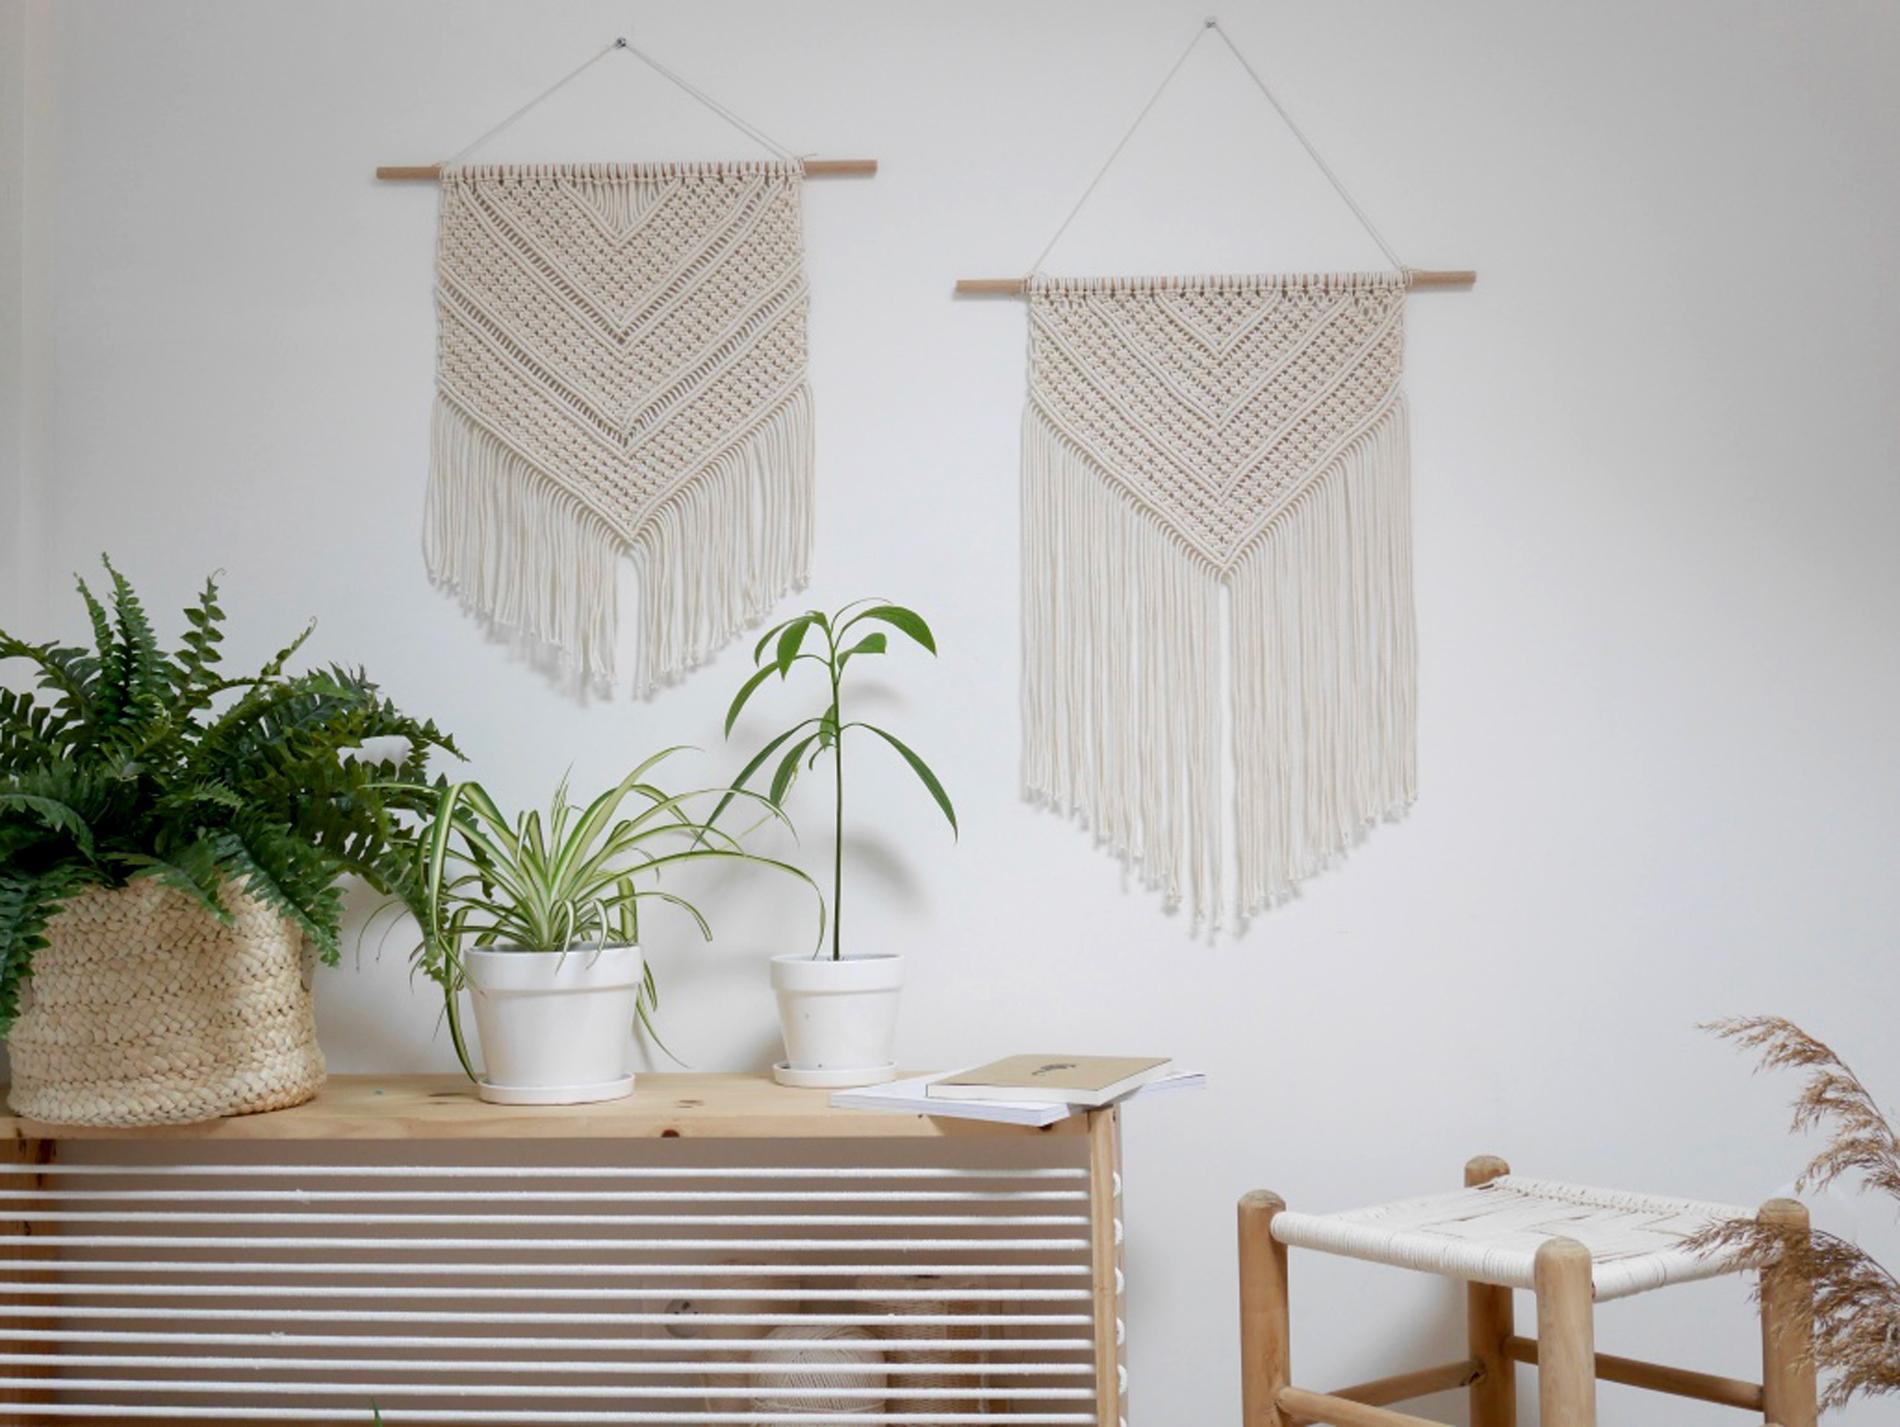 broderie macram crochet la d co ringarde redevient. Black Bedroom Furniture Sets. Home Design Ideas